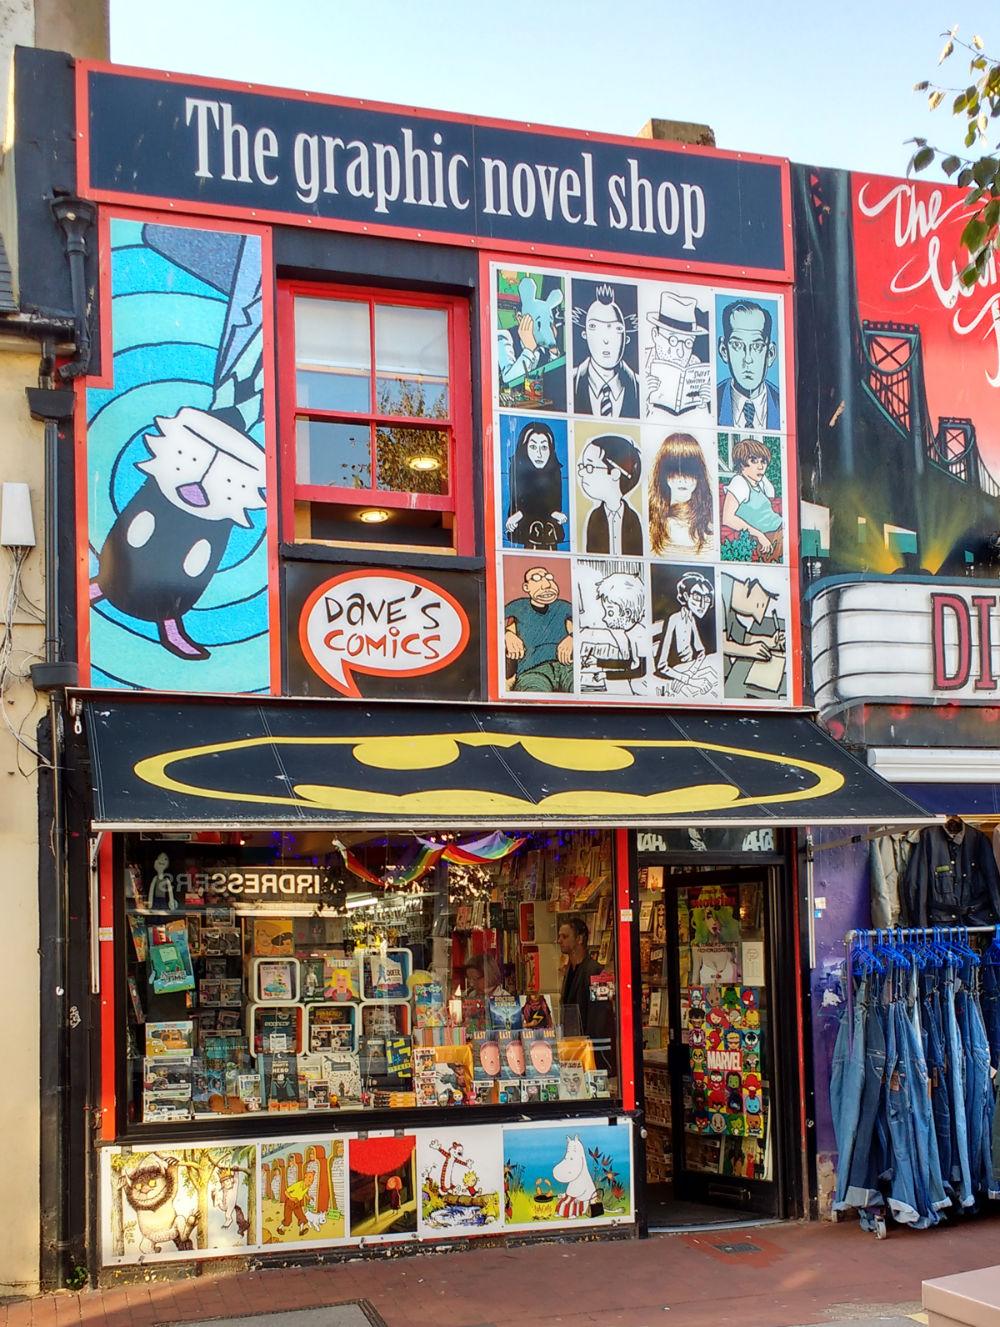 Dave's Comics (books) shop